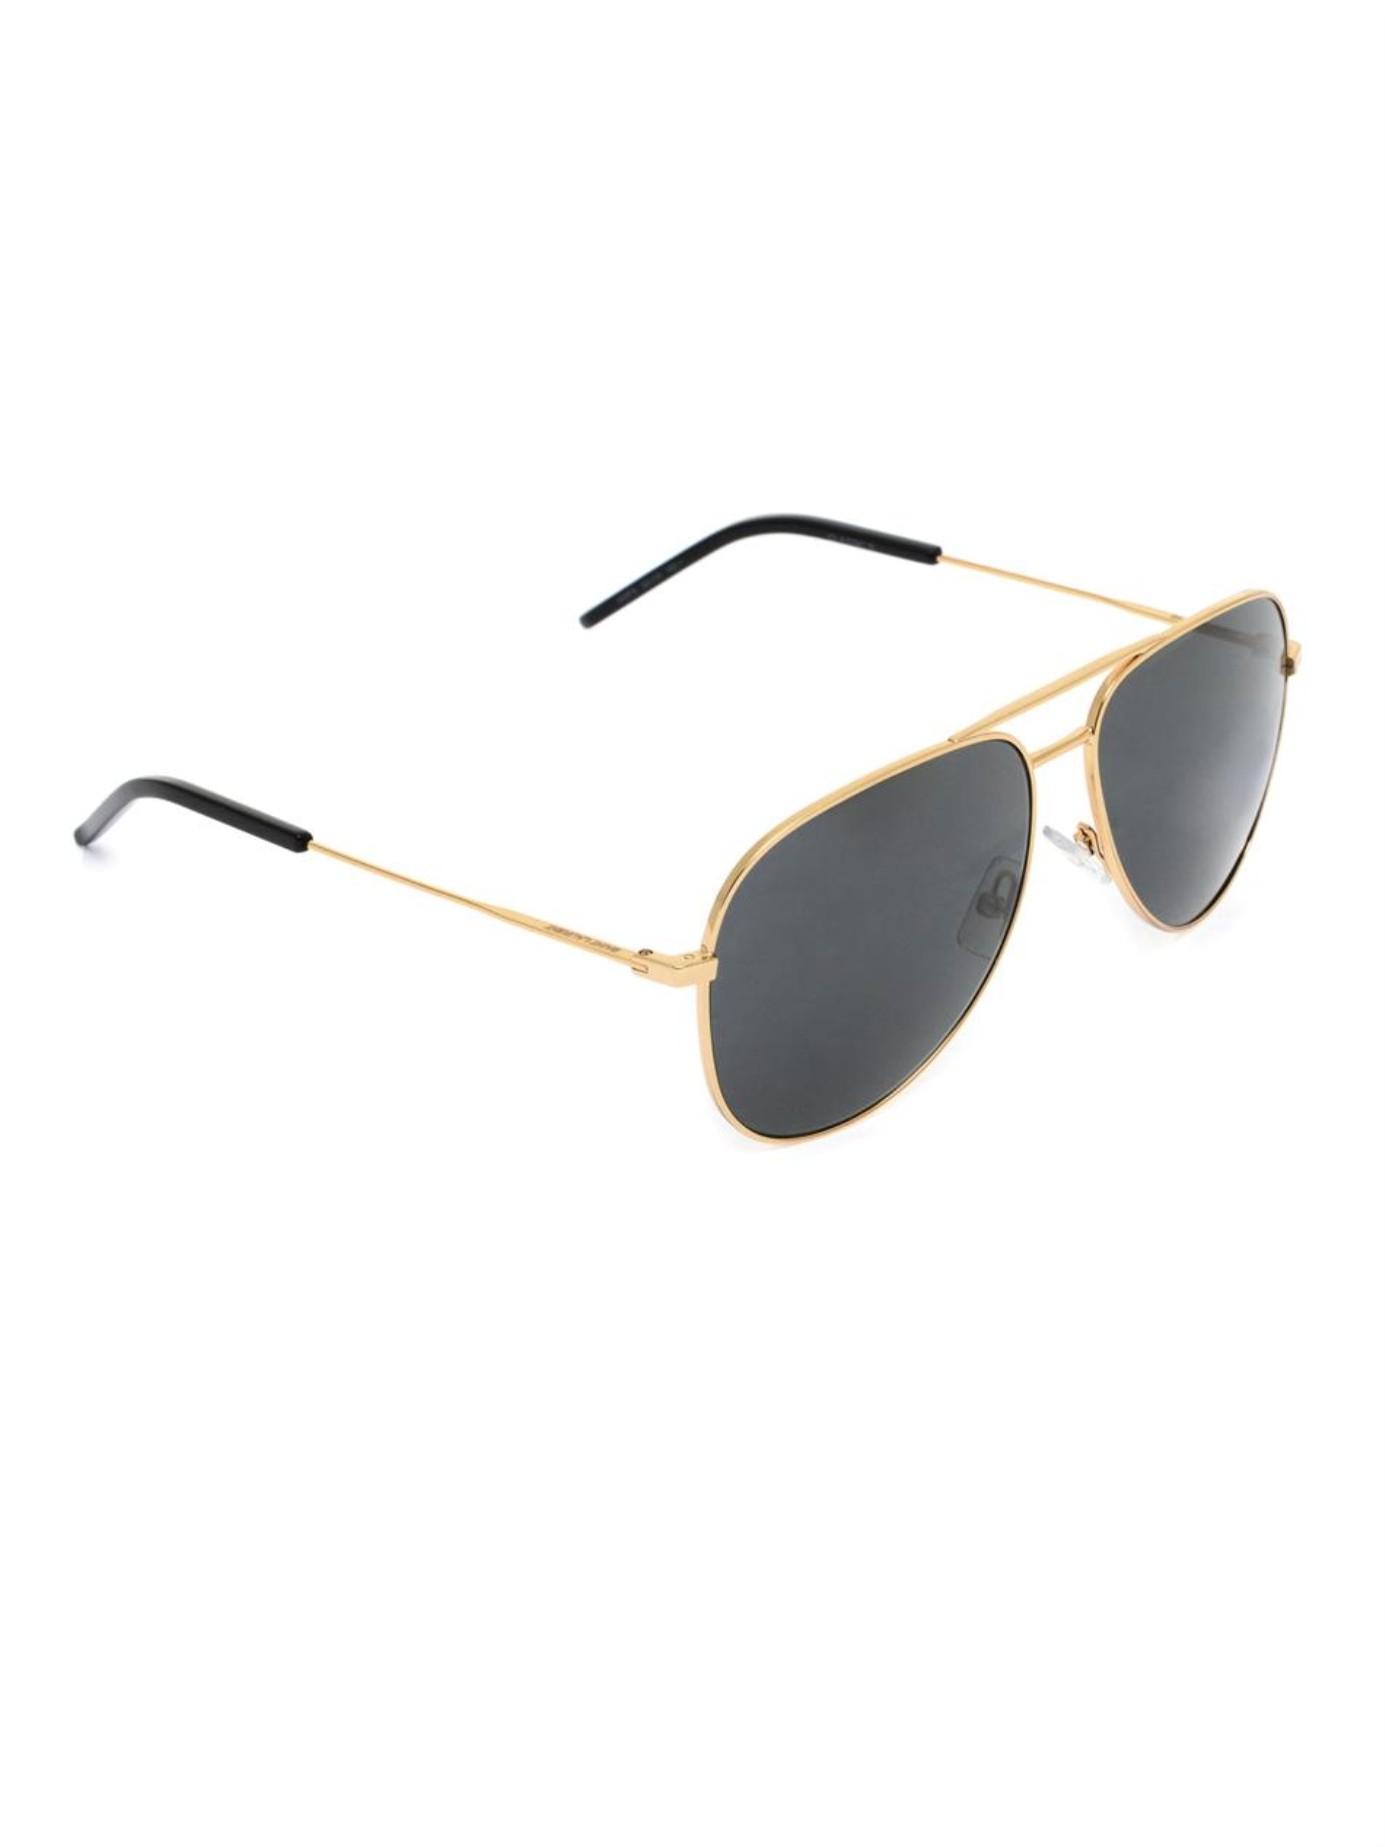 sunglasses aviator style  Saint laurent Classic 11 Aviator-Style Sunglasses in Metallic for ...